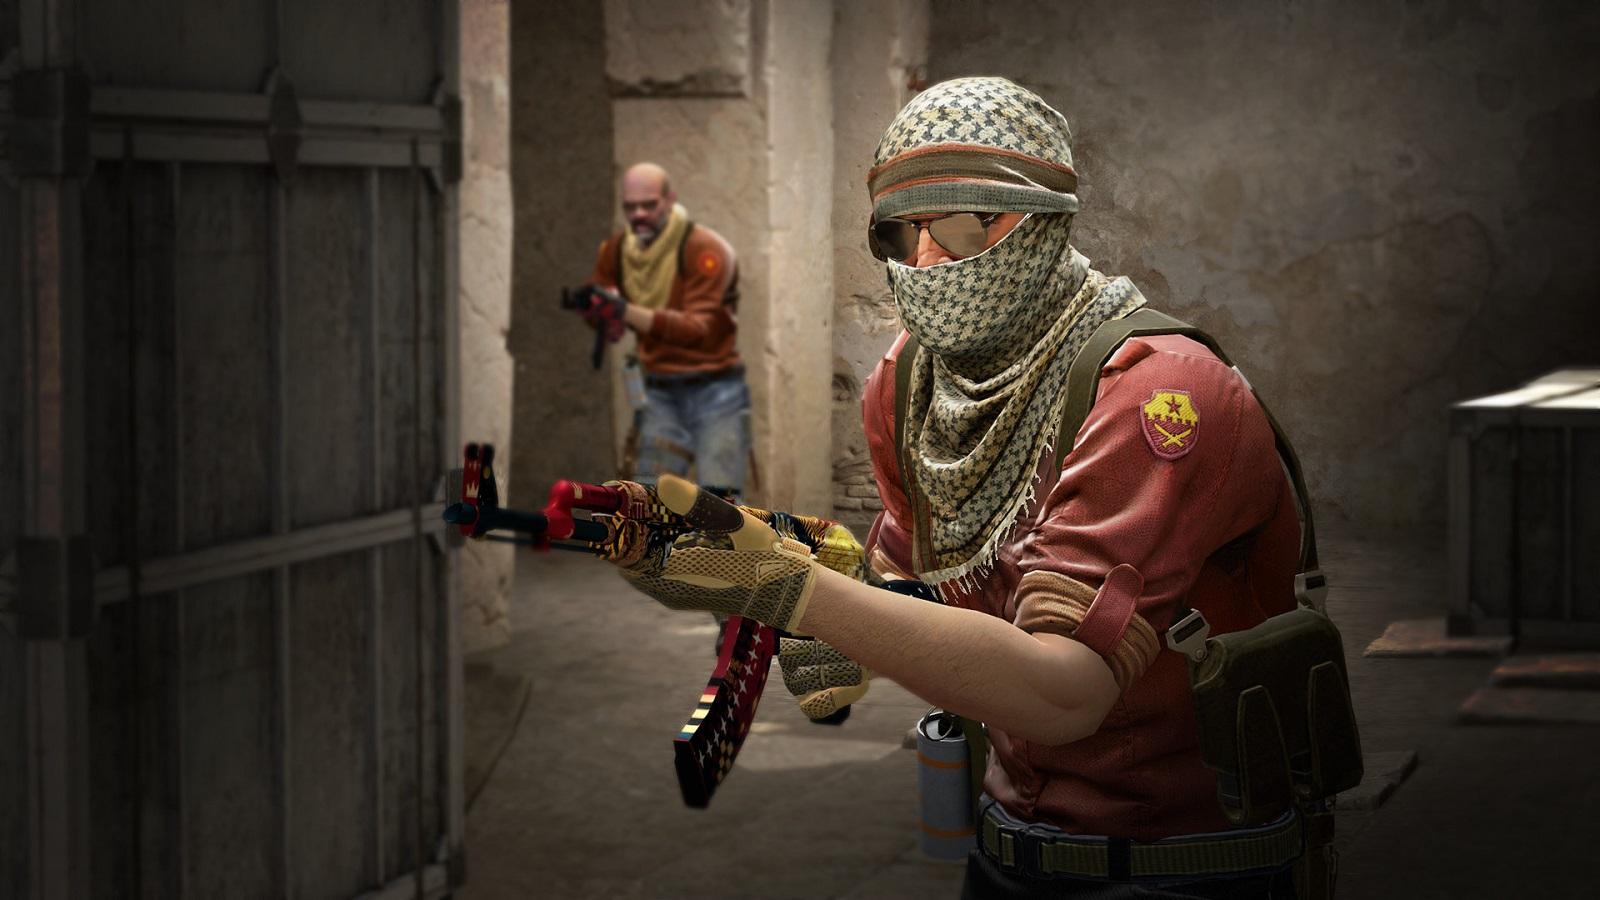 Valve удалила из Steam страницу Counter-Strike: Global Offensive — зачем и почему, пока непонятно [Обновлено]